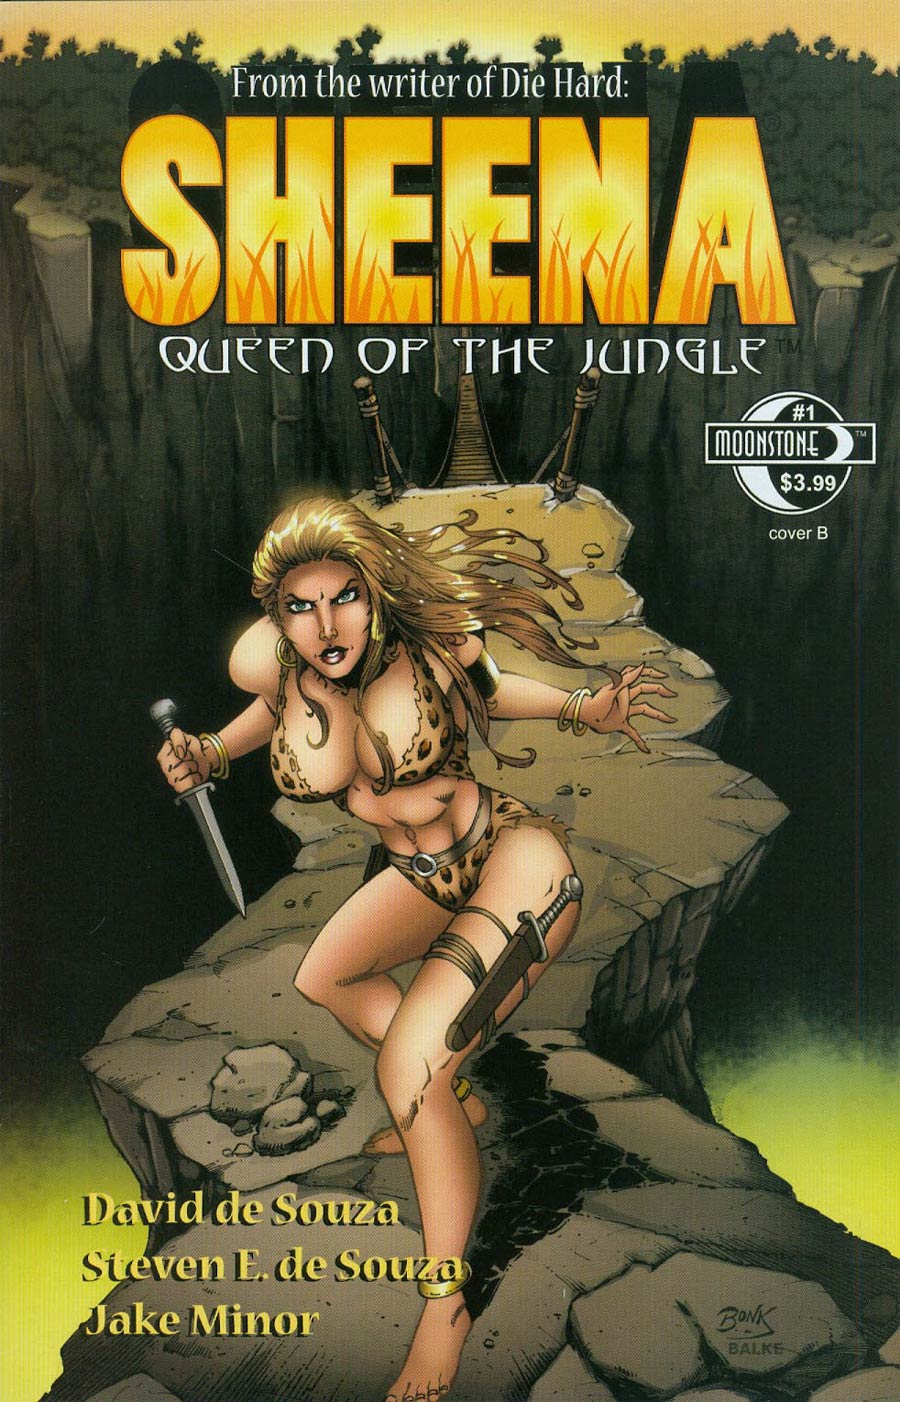 Sheena Vol 3 #1 Cover B Rich Bonk